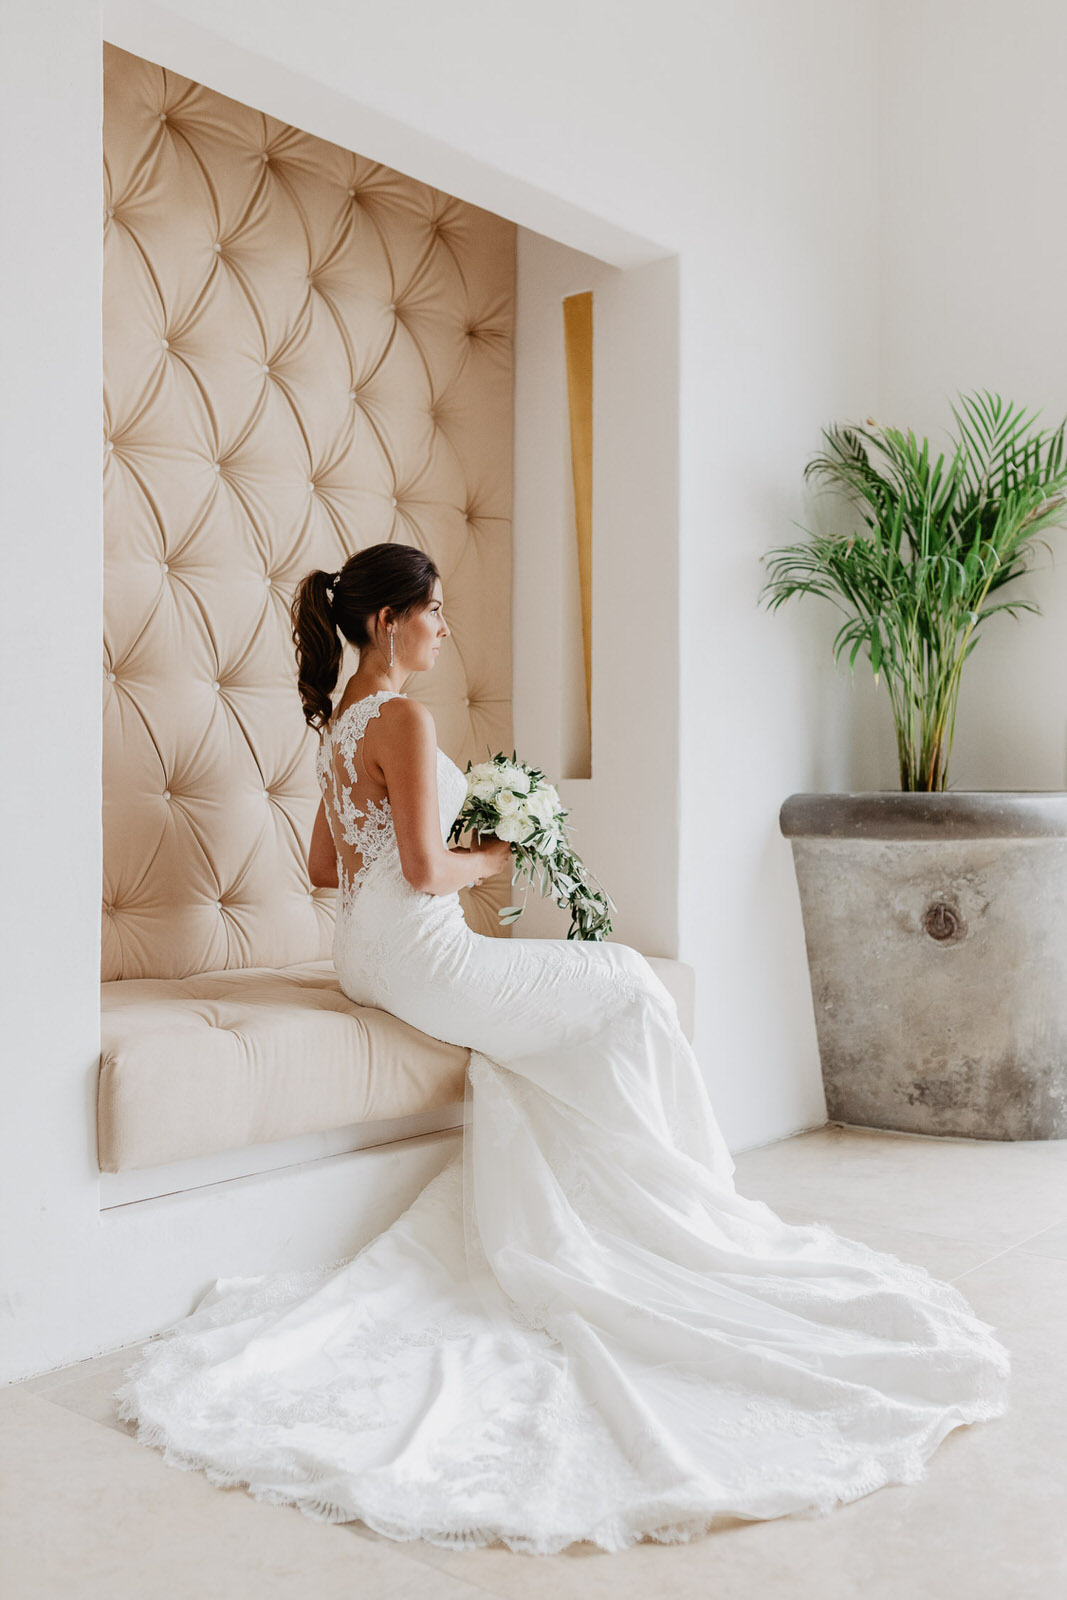 Christina-Hohner_Photography_Hochzeitslocation_Magical-Homes_Heroldstatt-10-von-65-2.jpg